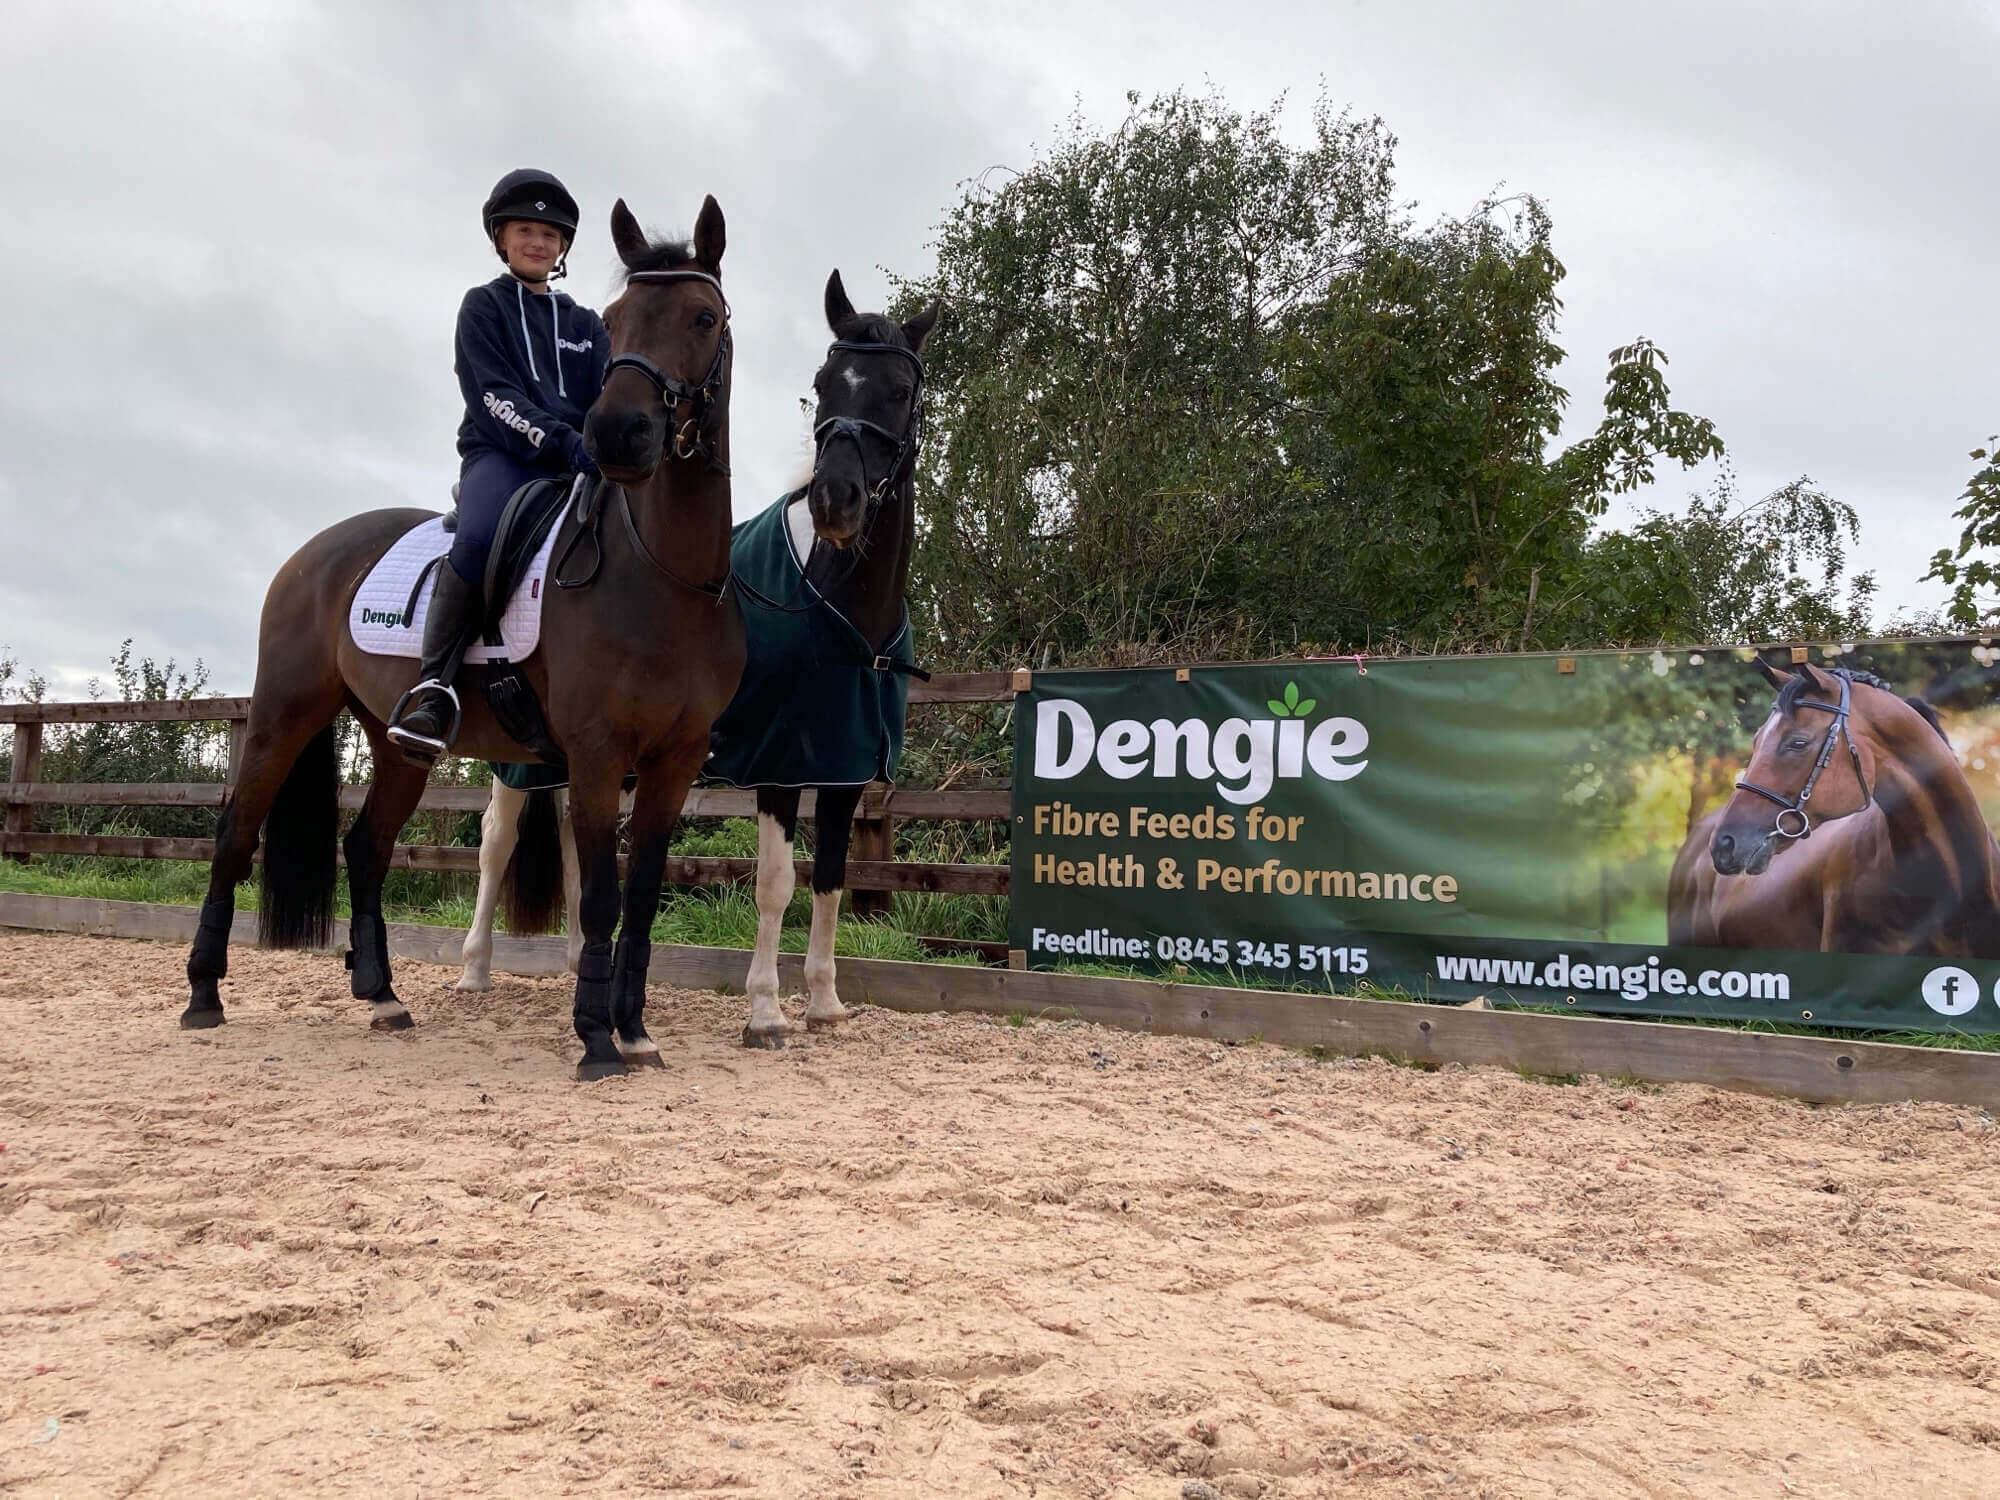 Horses next to Dengie banner